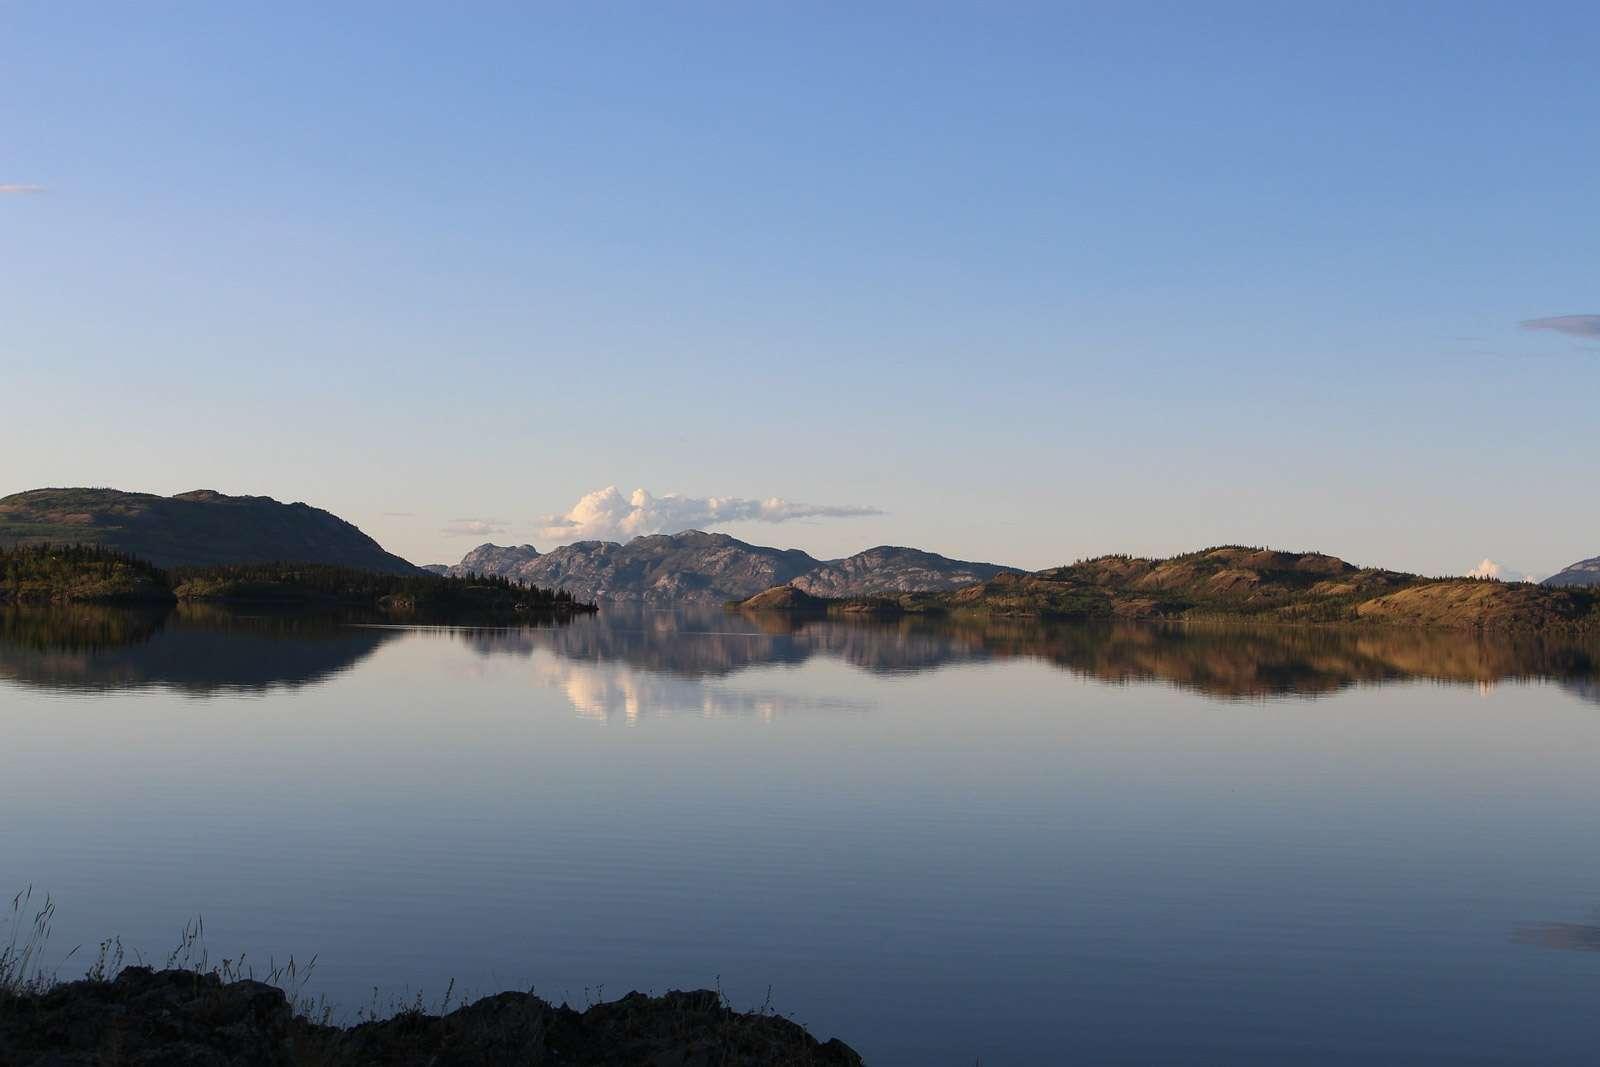 Le fleuve Yukon   Le classique   Lake Laberge vers Dawson City